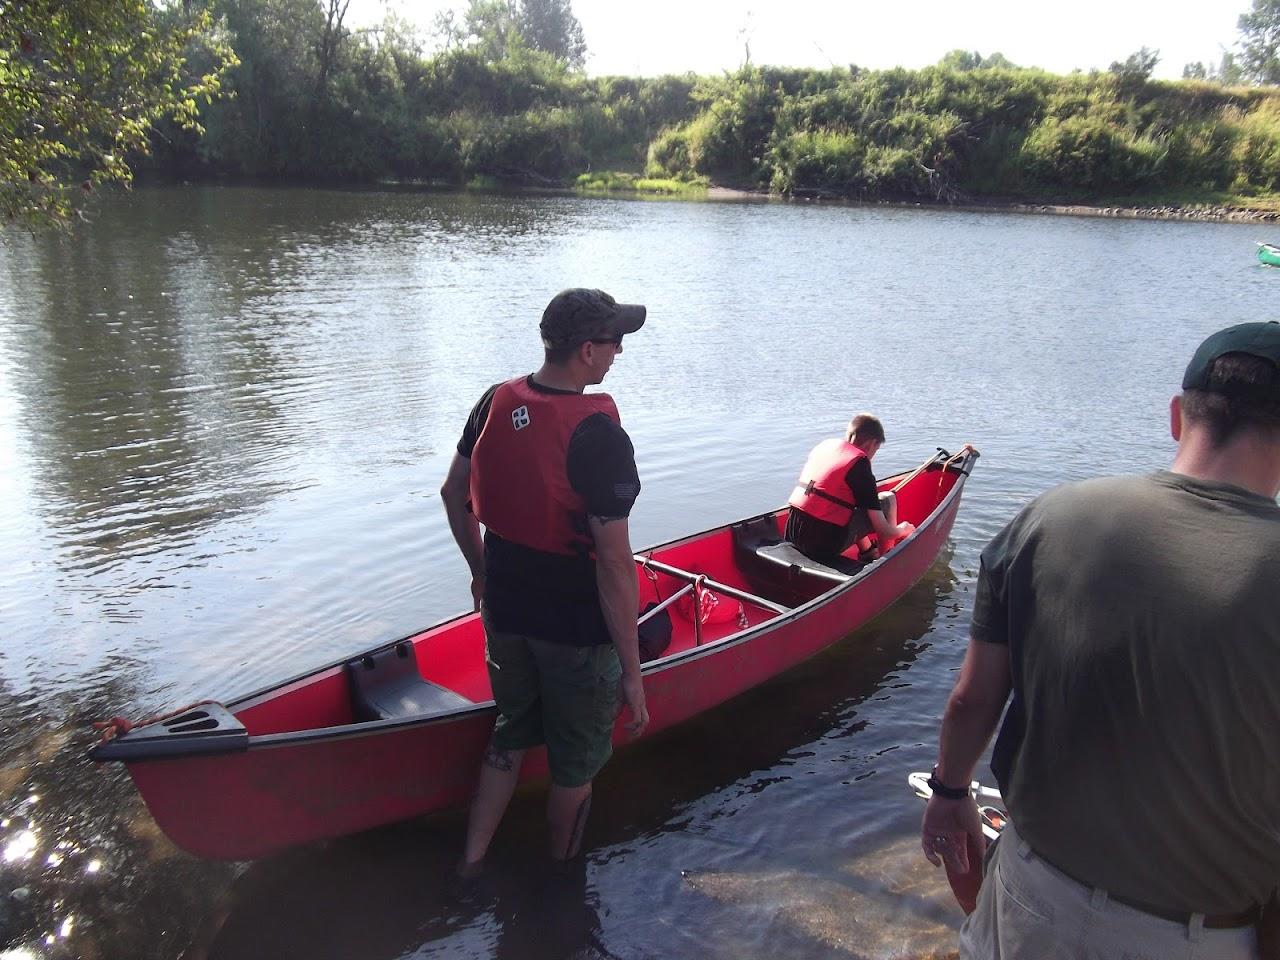 Skookumchuck River 2012 - DSCF1818.JPG